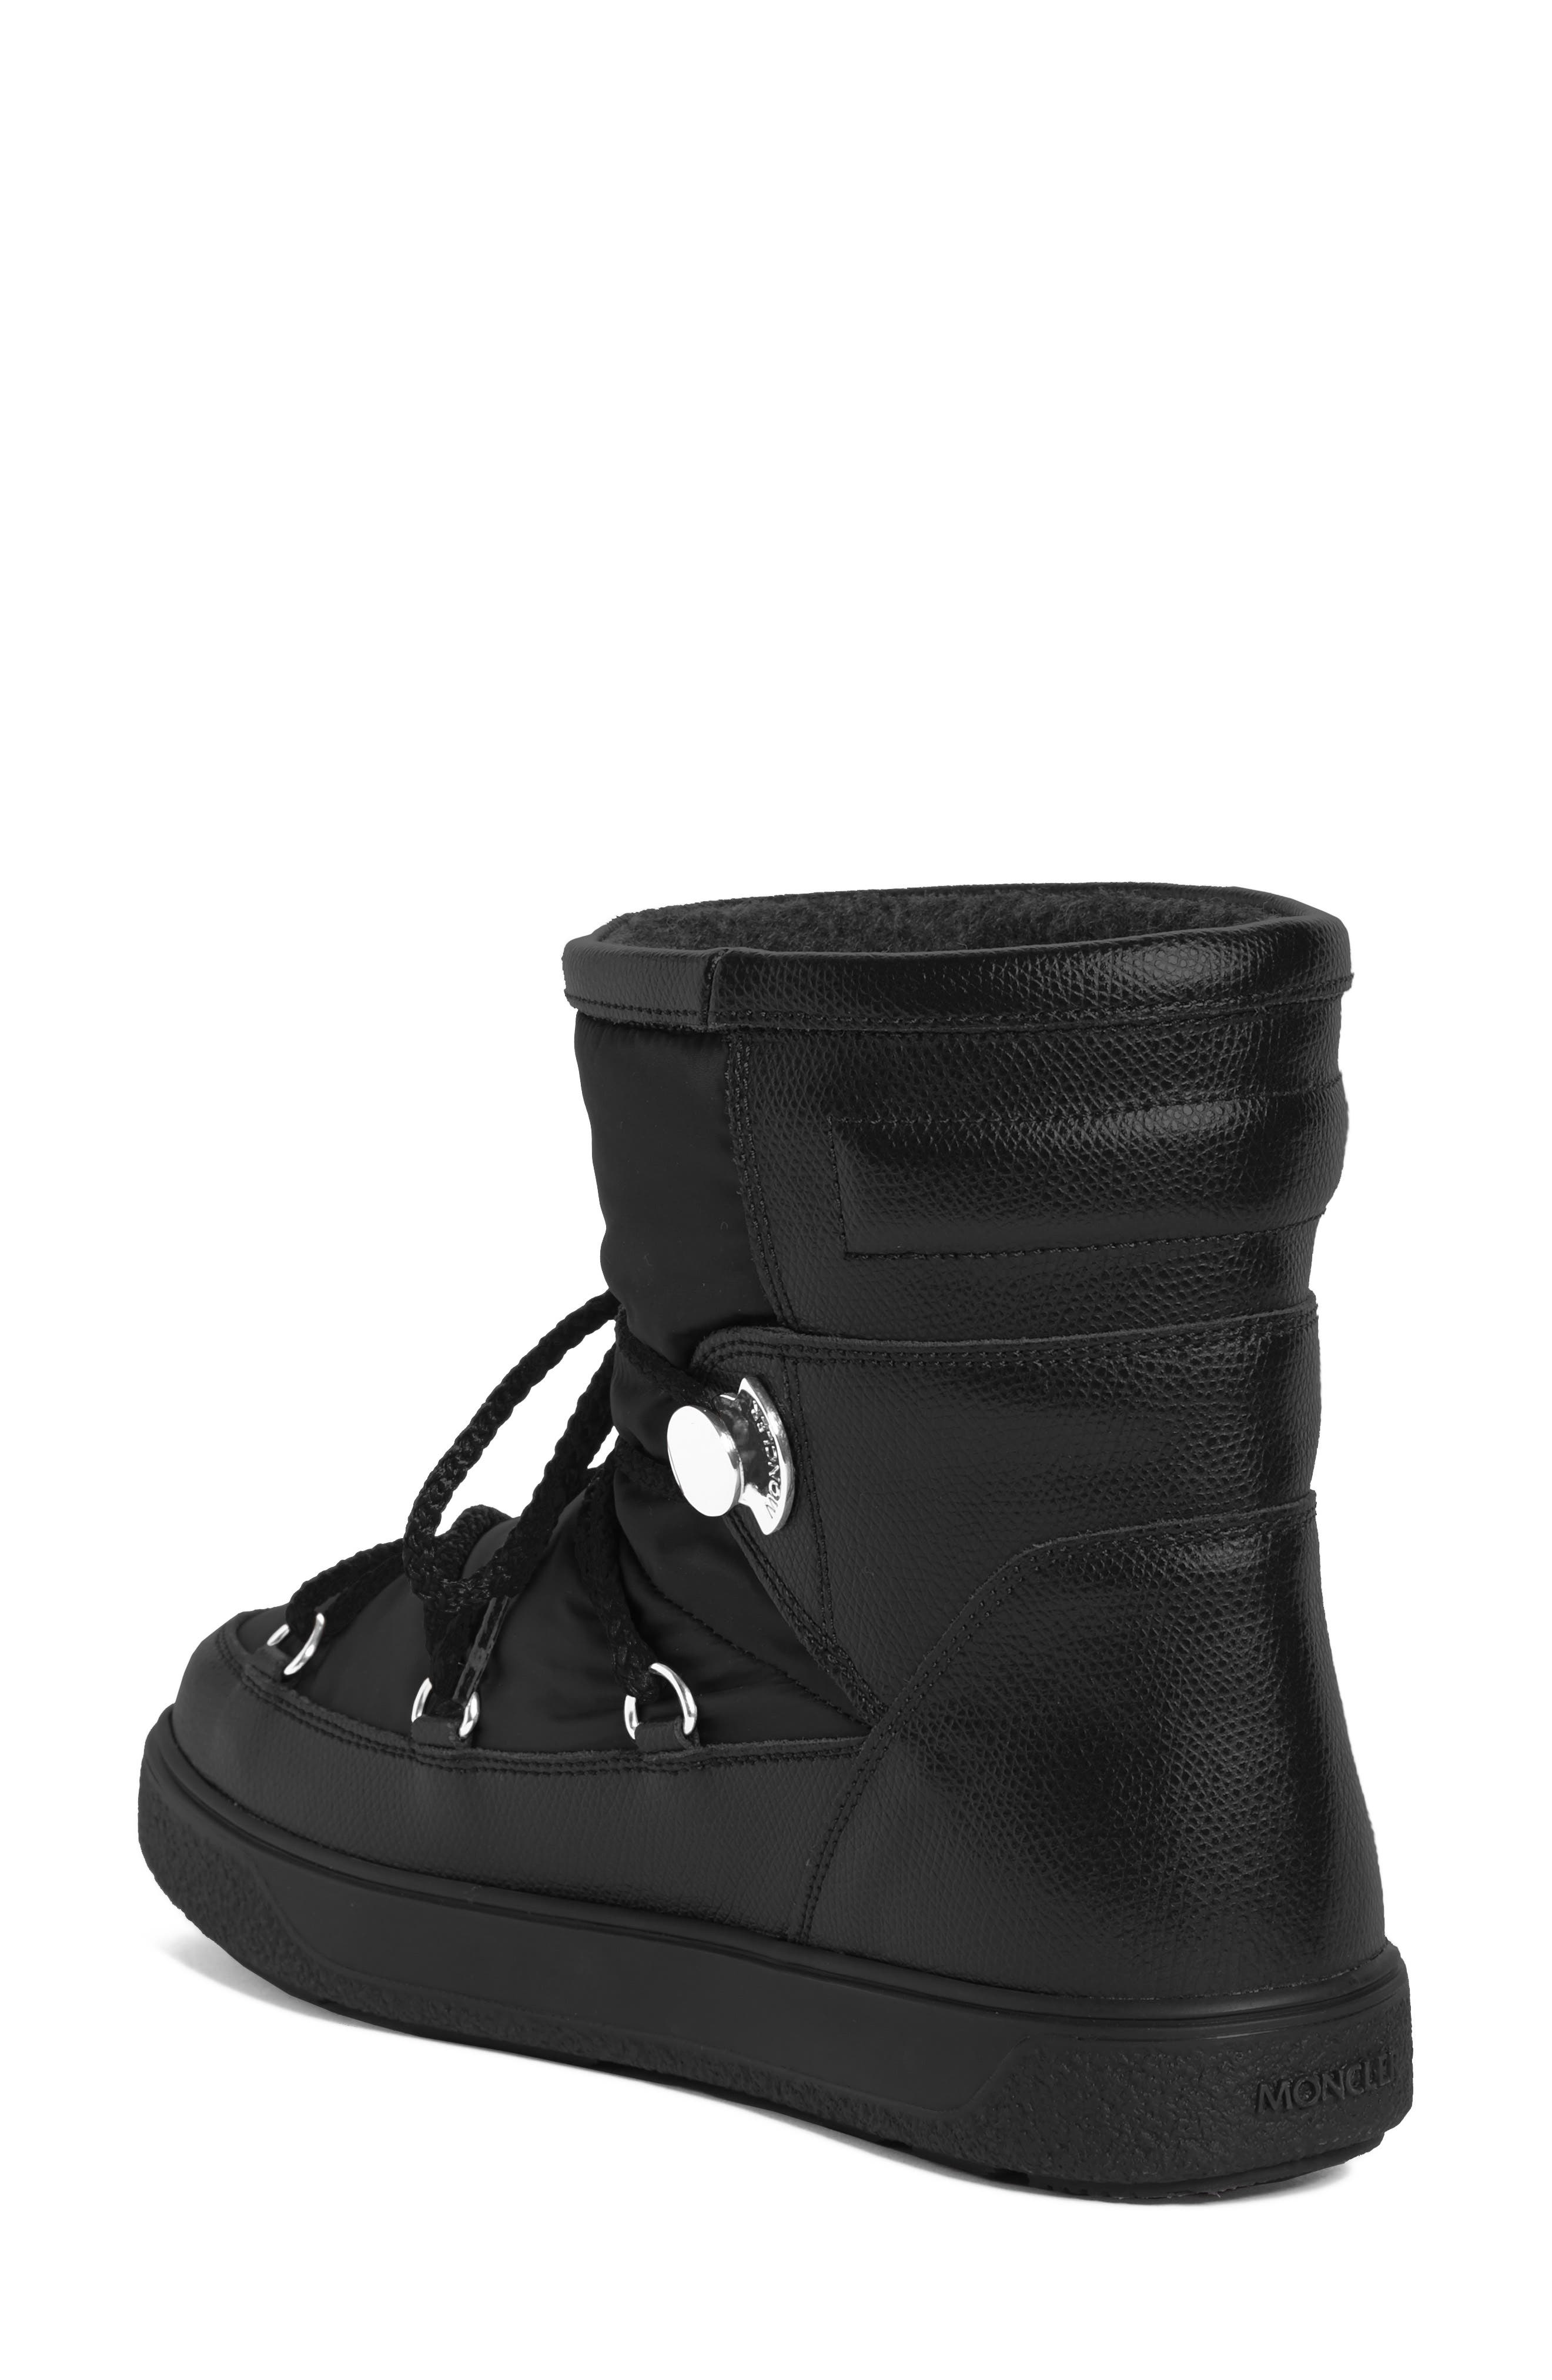 New Fanny Stivale Short Boots,                             Alternate thumbnail 2, color,                             001